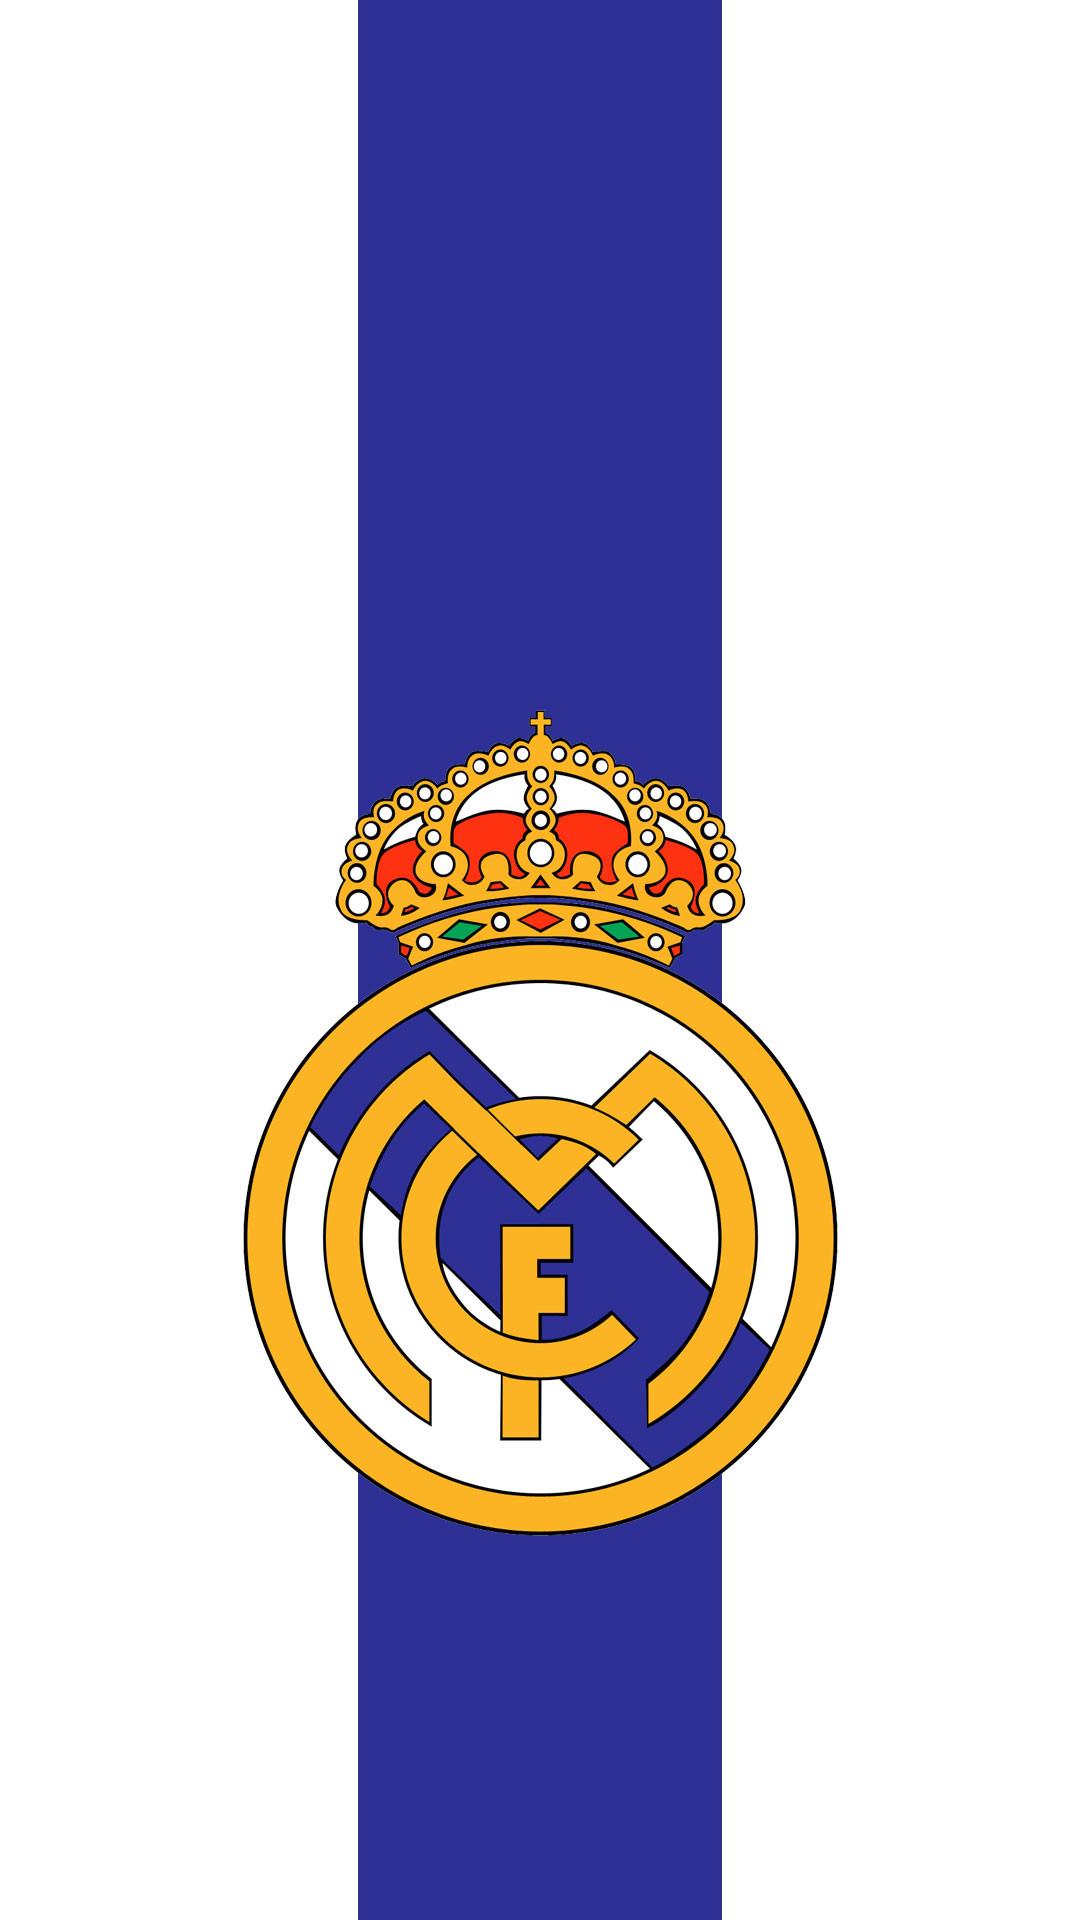 Real Madrid Lockscreen Wallpaper 1080 x 1920 …